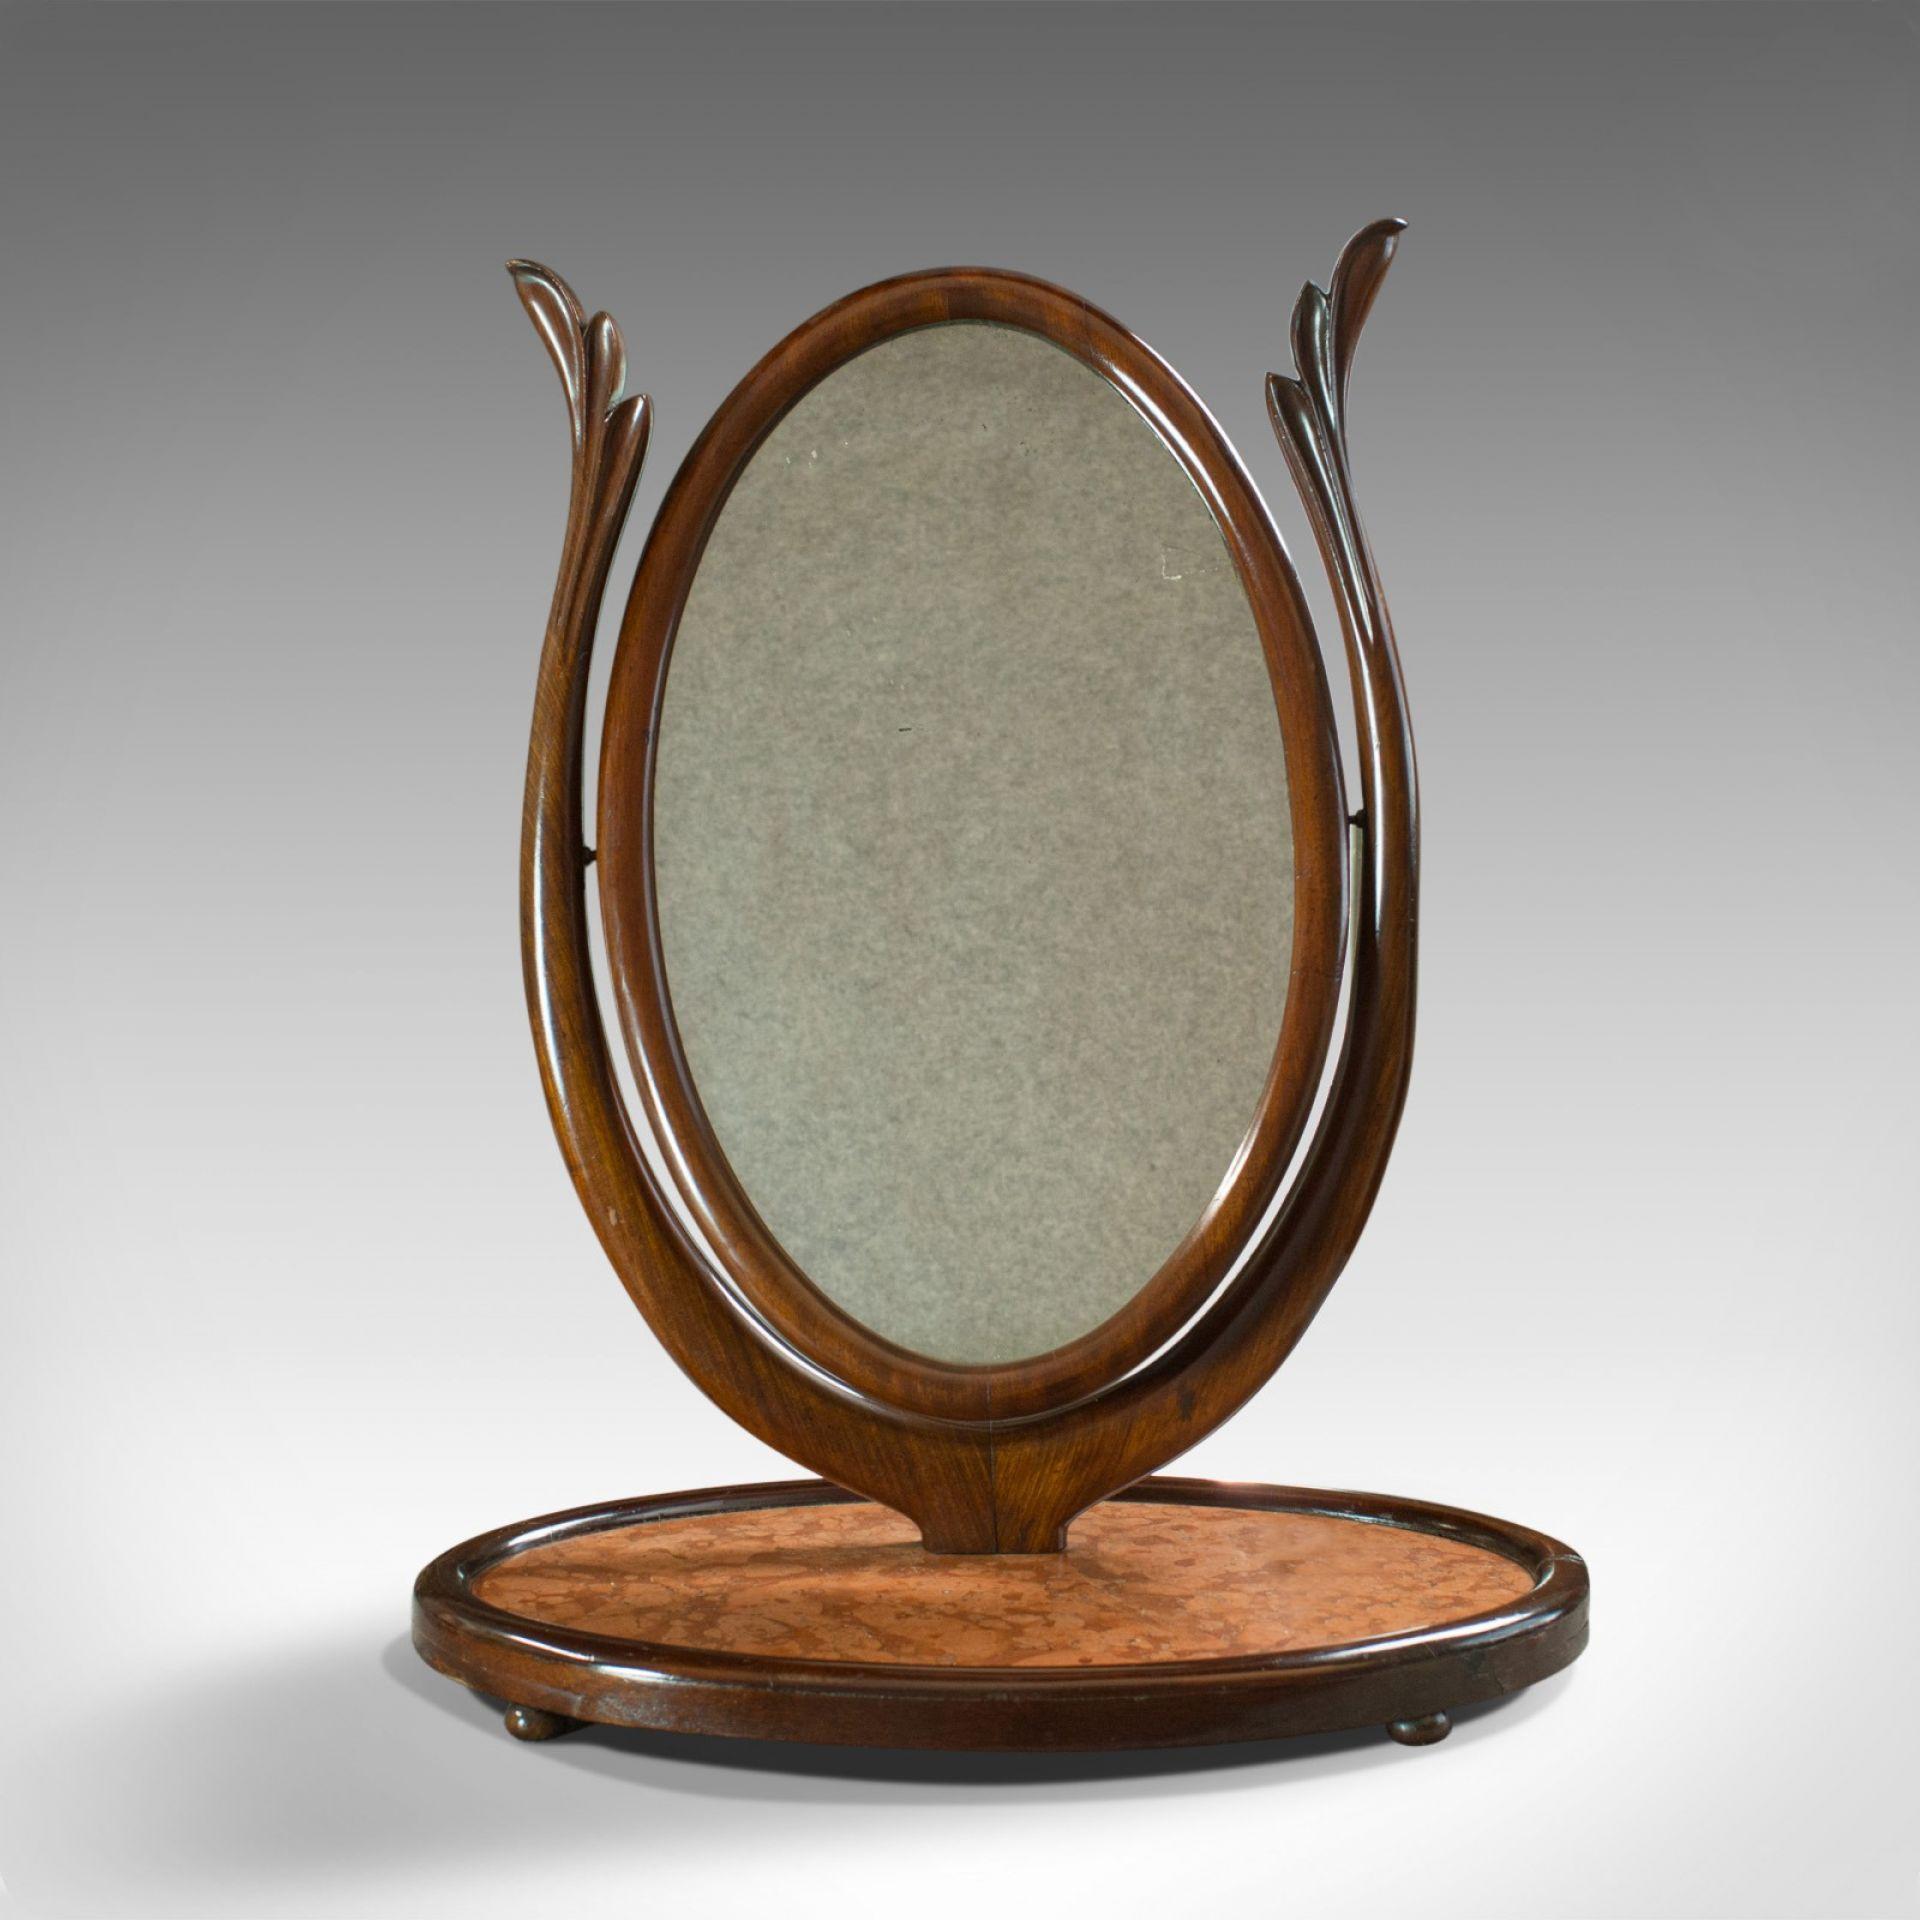 Antique Platform Mirror, Regency, Mahogany, Vanity, Toilet, Swing, Circa 1830